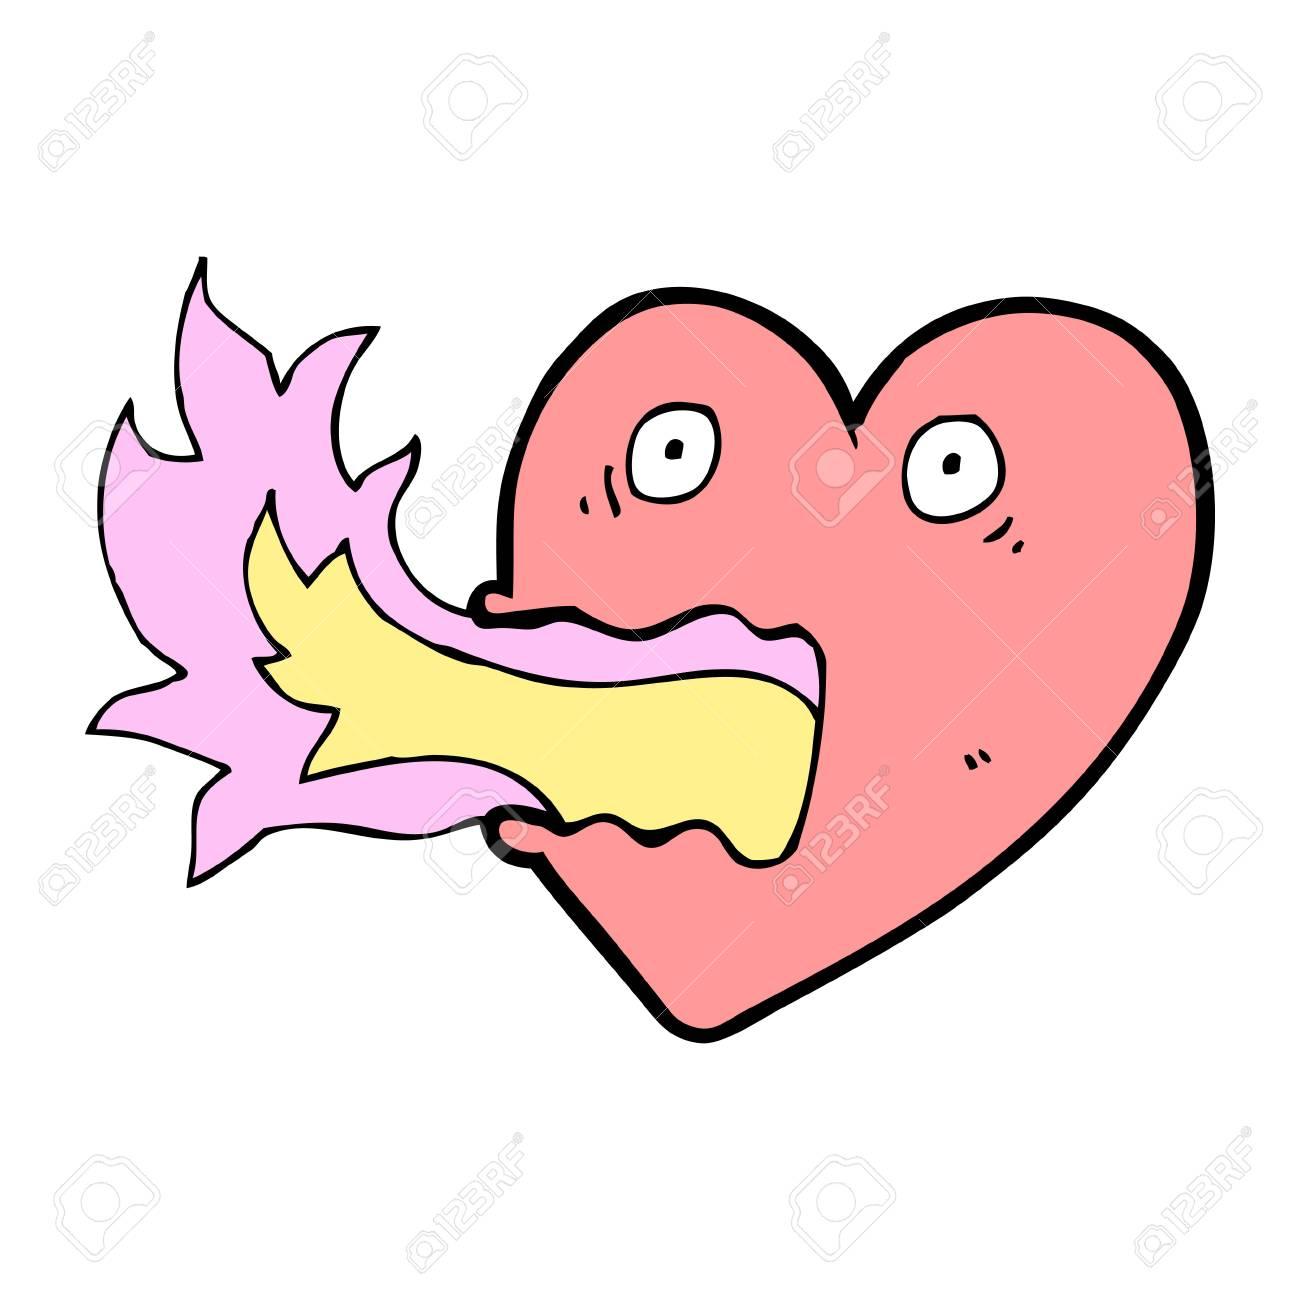 cartoon heart with flames Stock Vector - 16124821